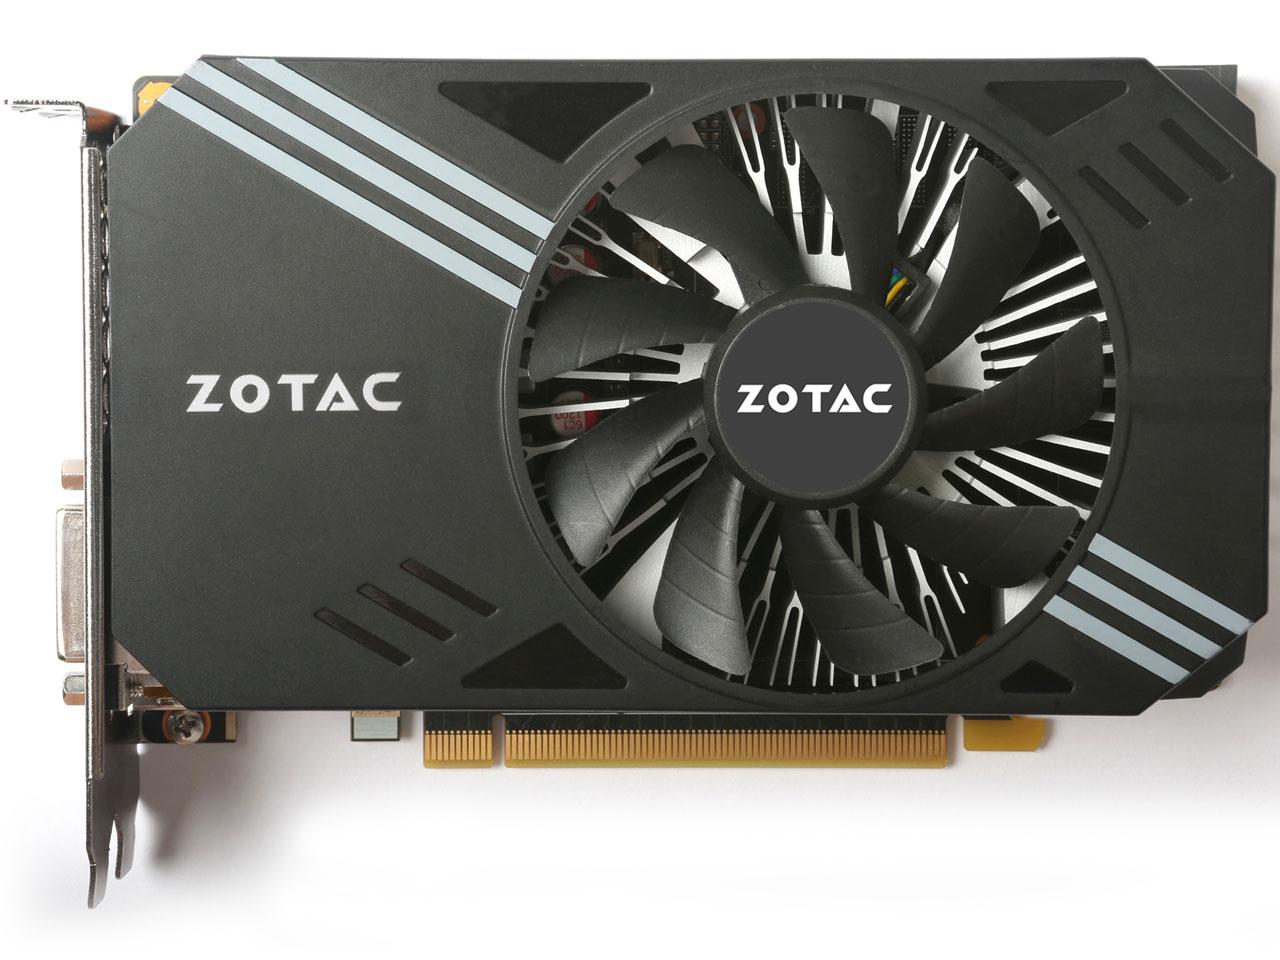 『本体1』 ZOTAC GeForce GTX 1060 6GB Single Fan ZT-P10600A-10L [PCIExp 6GB] の製品画像